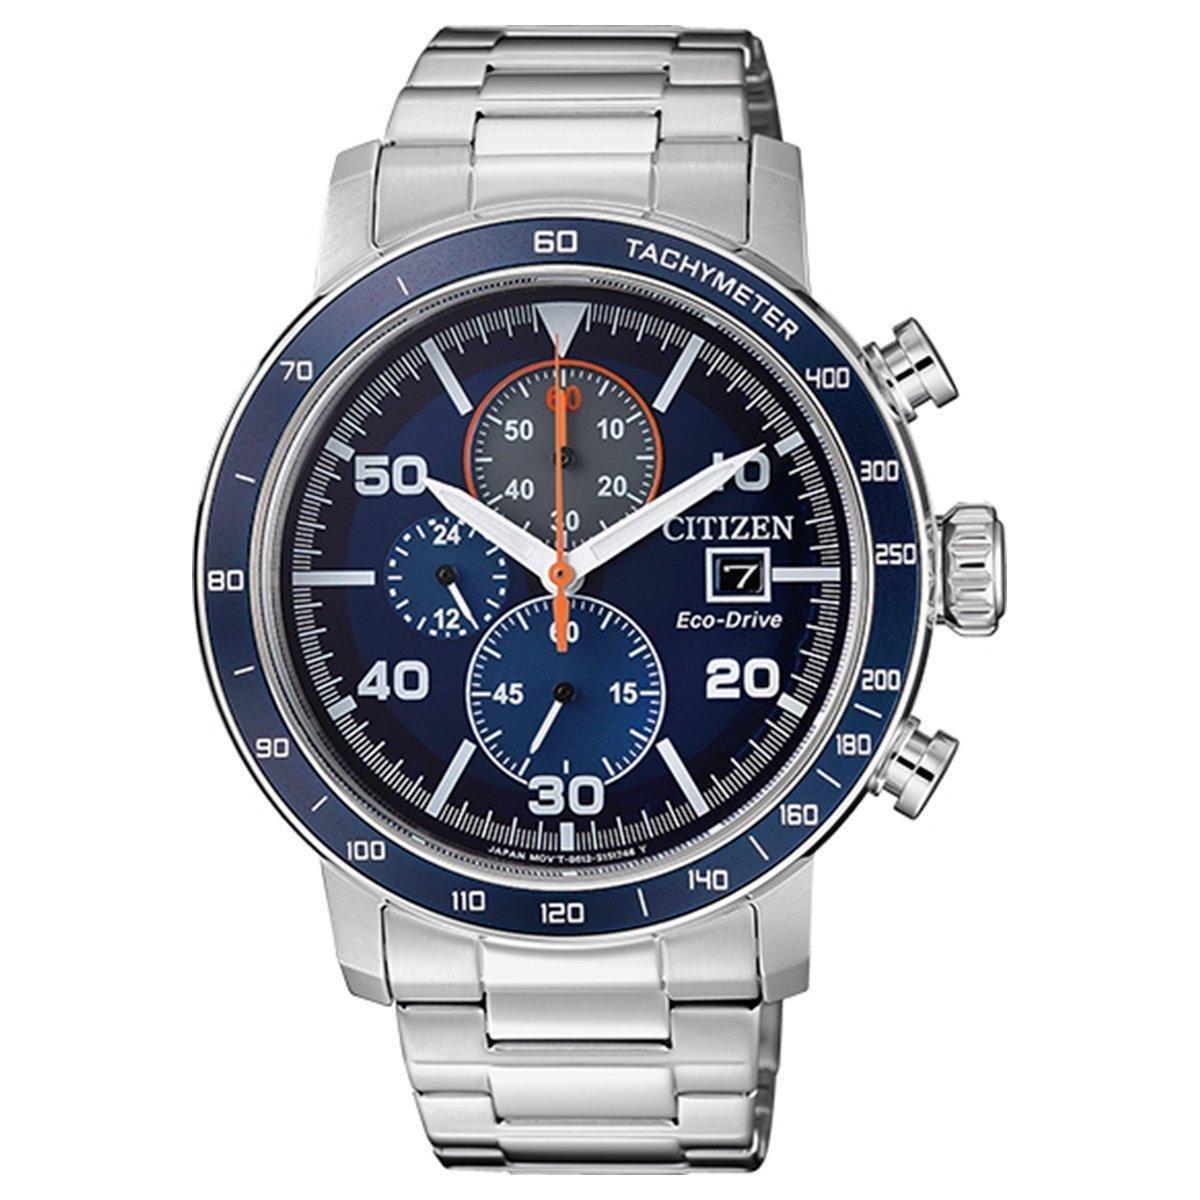 ae4a9f6a6ac Relógio Citizen Analógico TZ31187F Masculino - Prata - Compre Agora ...